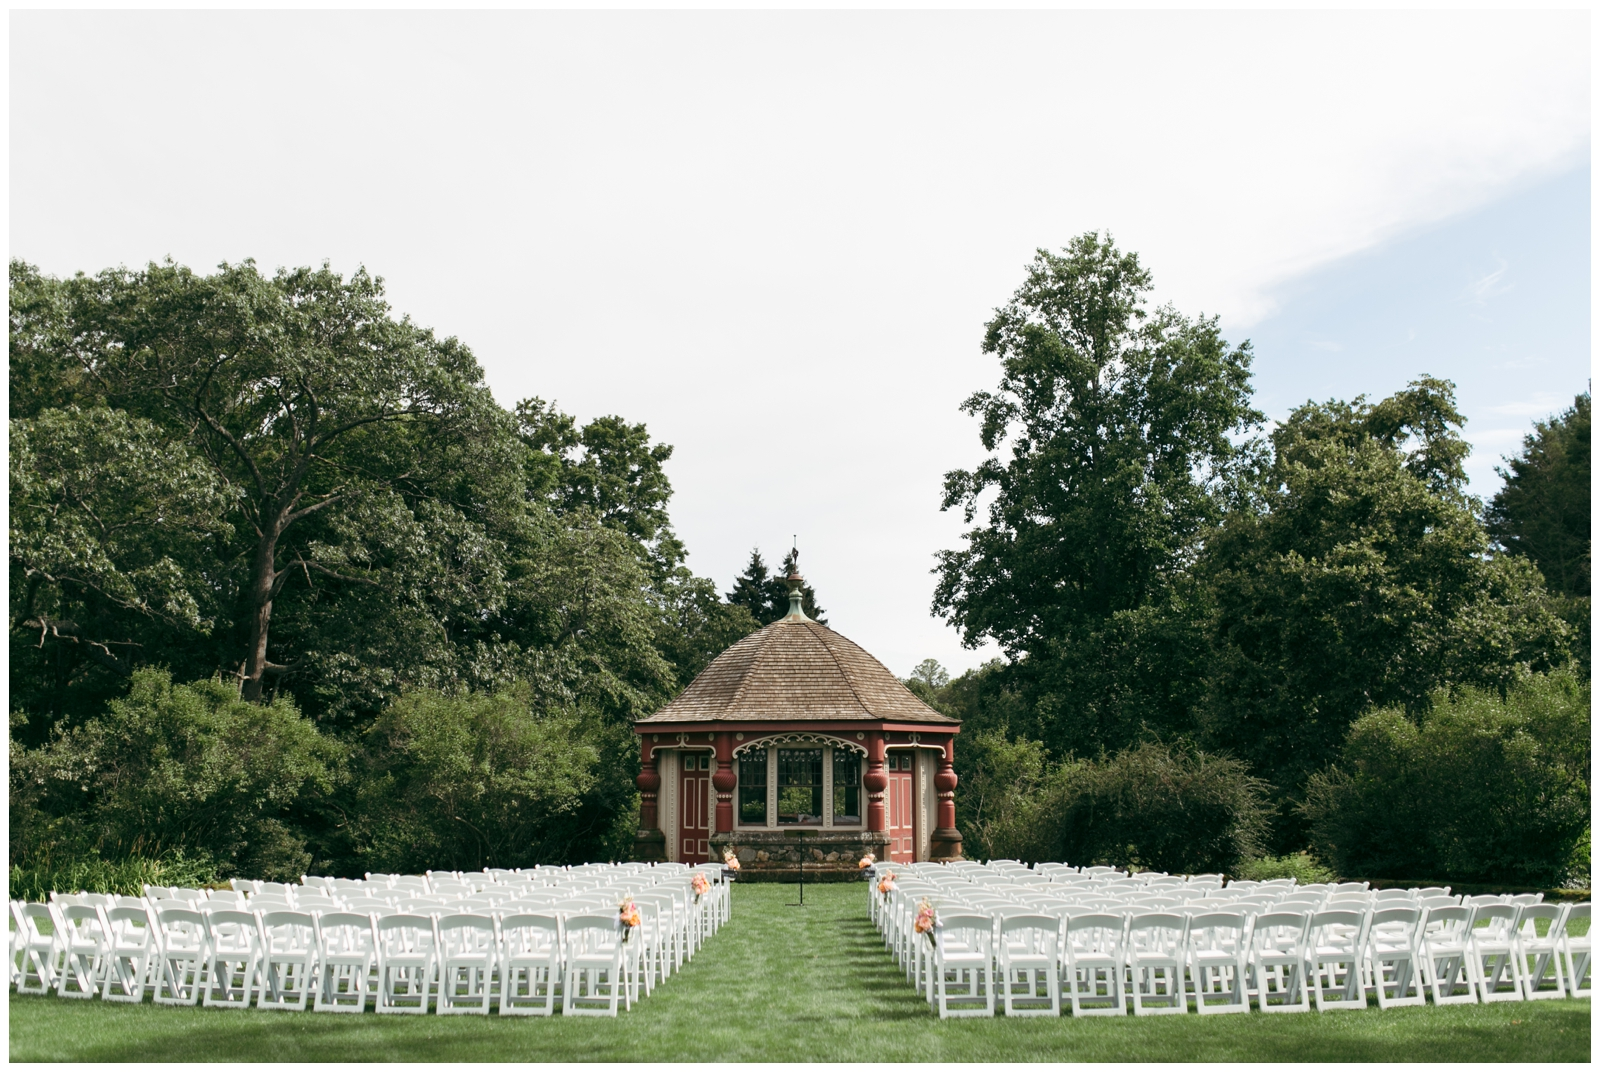 Moraine-Farm-wedding-Bailey-Q-Photo-Massachusetts-wedding-photpgrapher-049.jpg